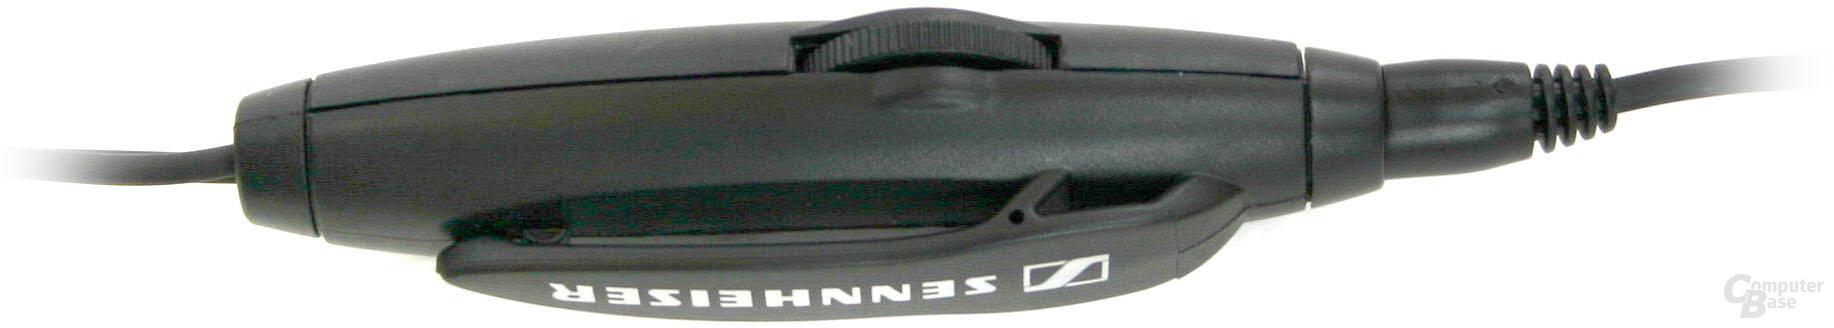 Sennheiser PC 150 Kabelschalter #2